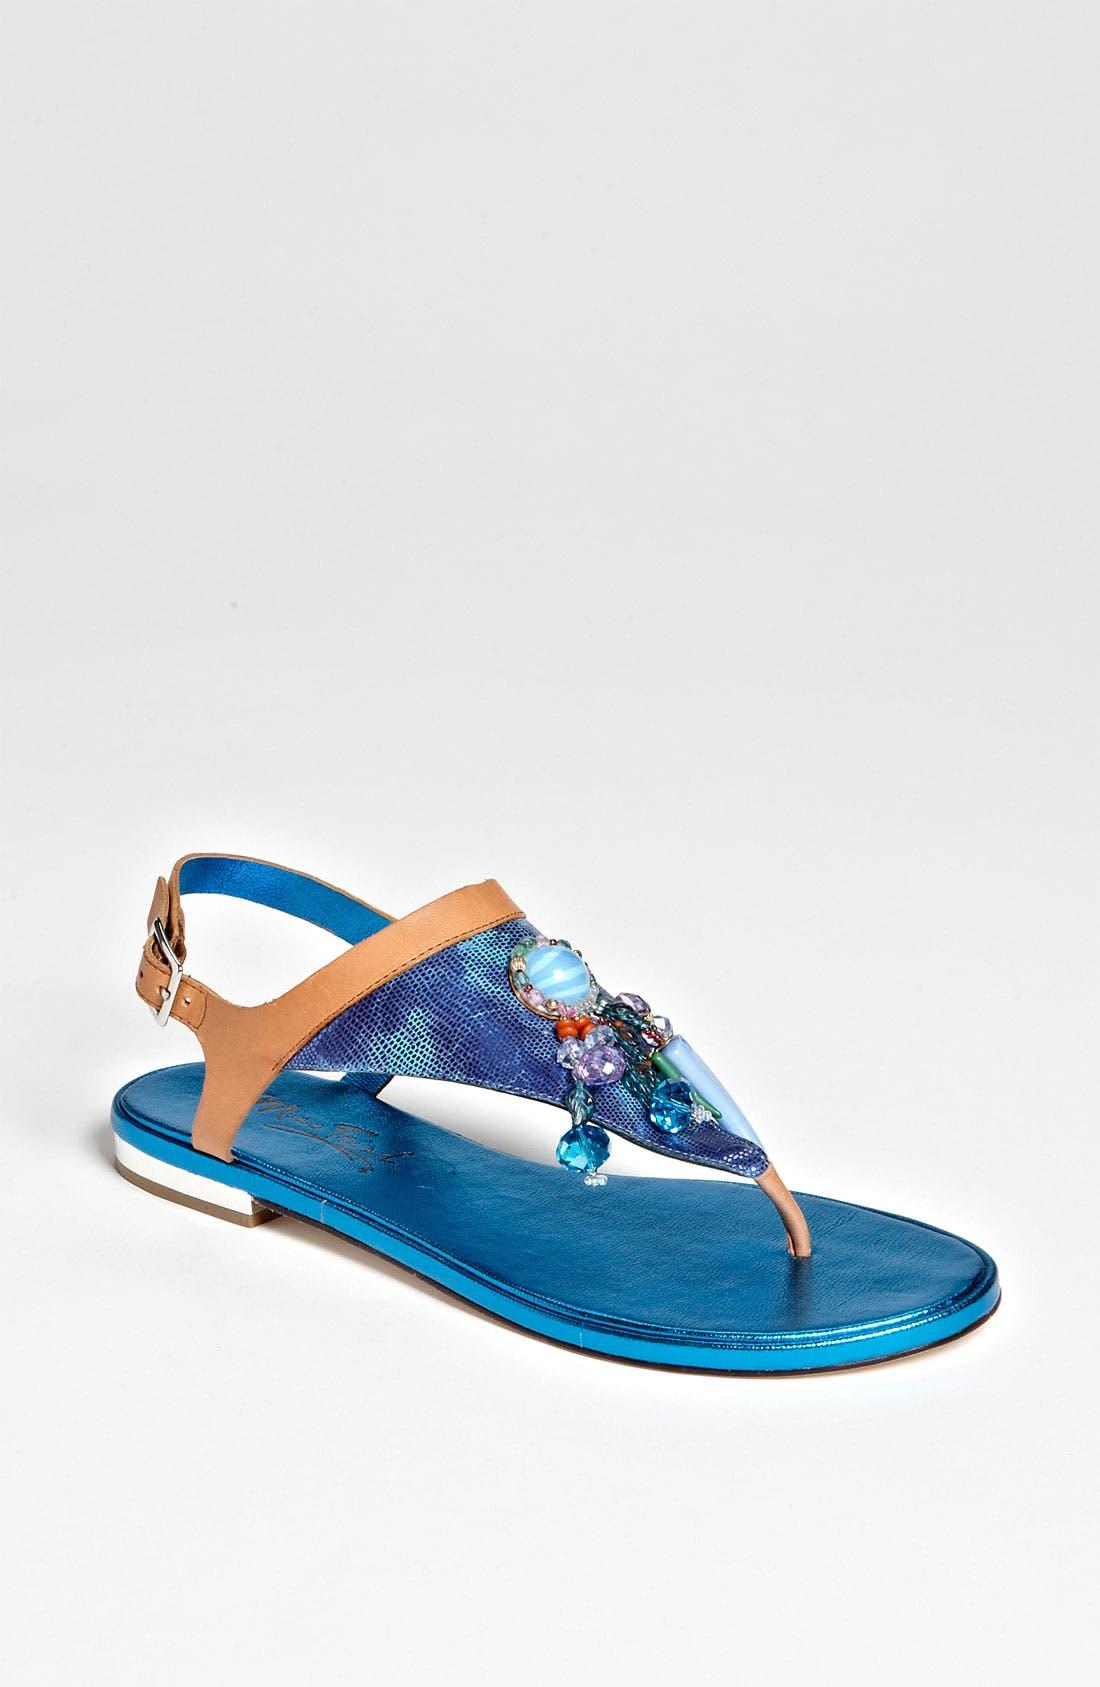 Main Image - Miss Trish 'Saber' Sandal